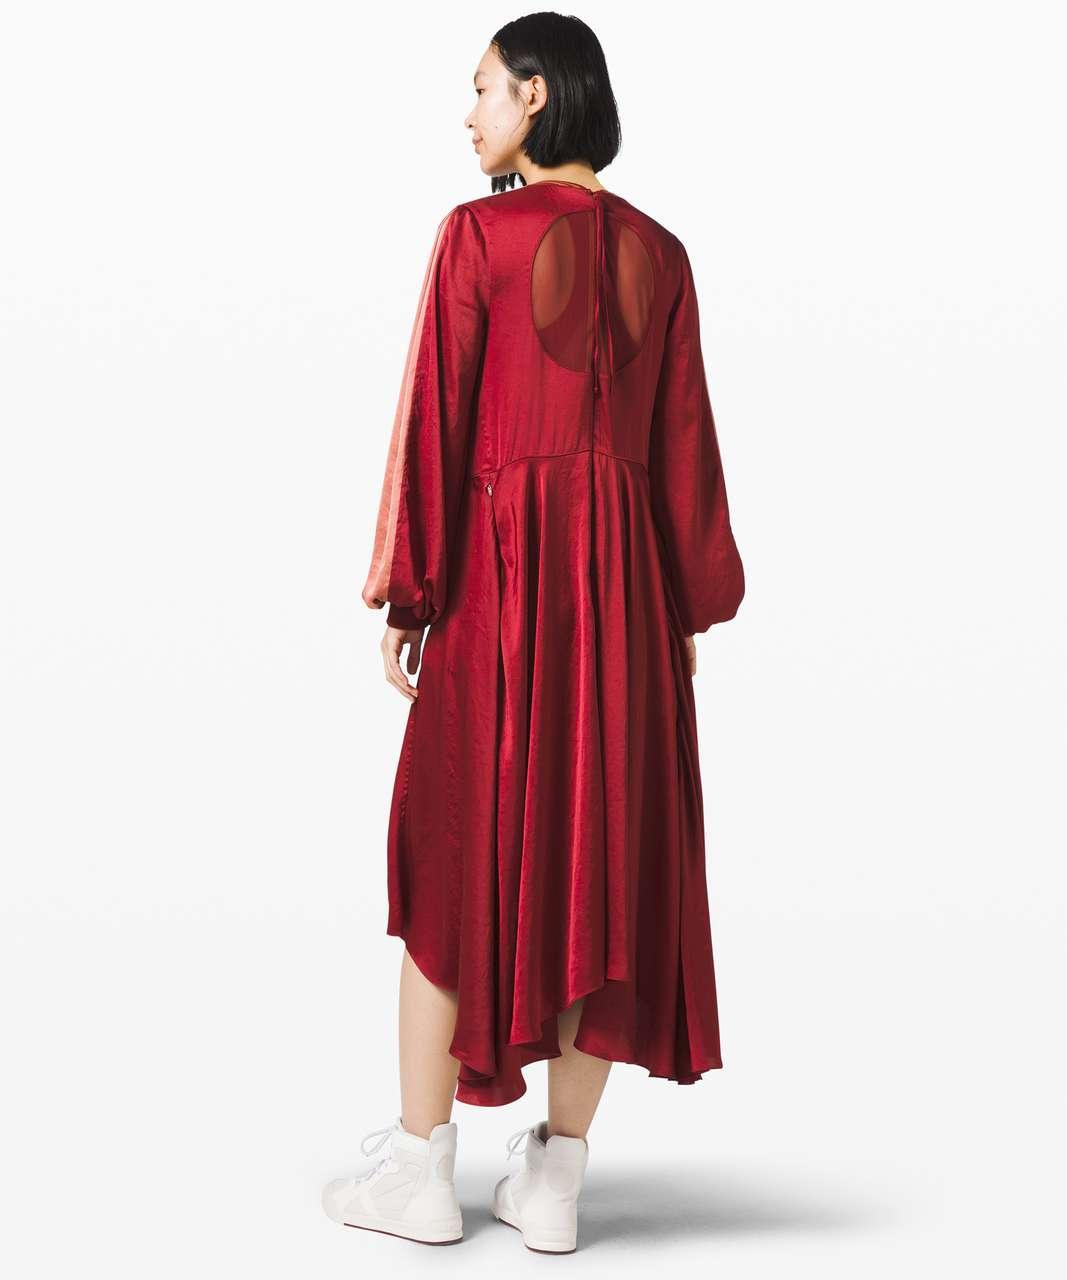 Lululemon Face Forward Dress *lululemon x Roksanda - Caliente / Rustic Coral